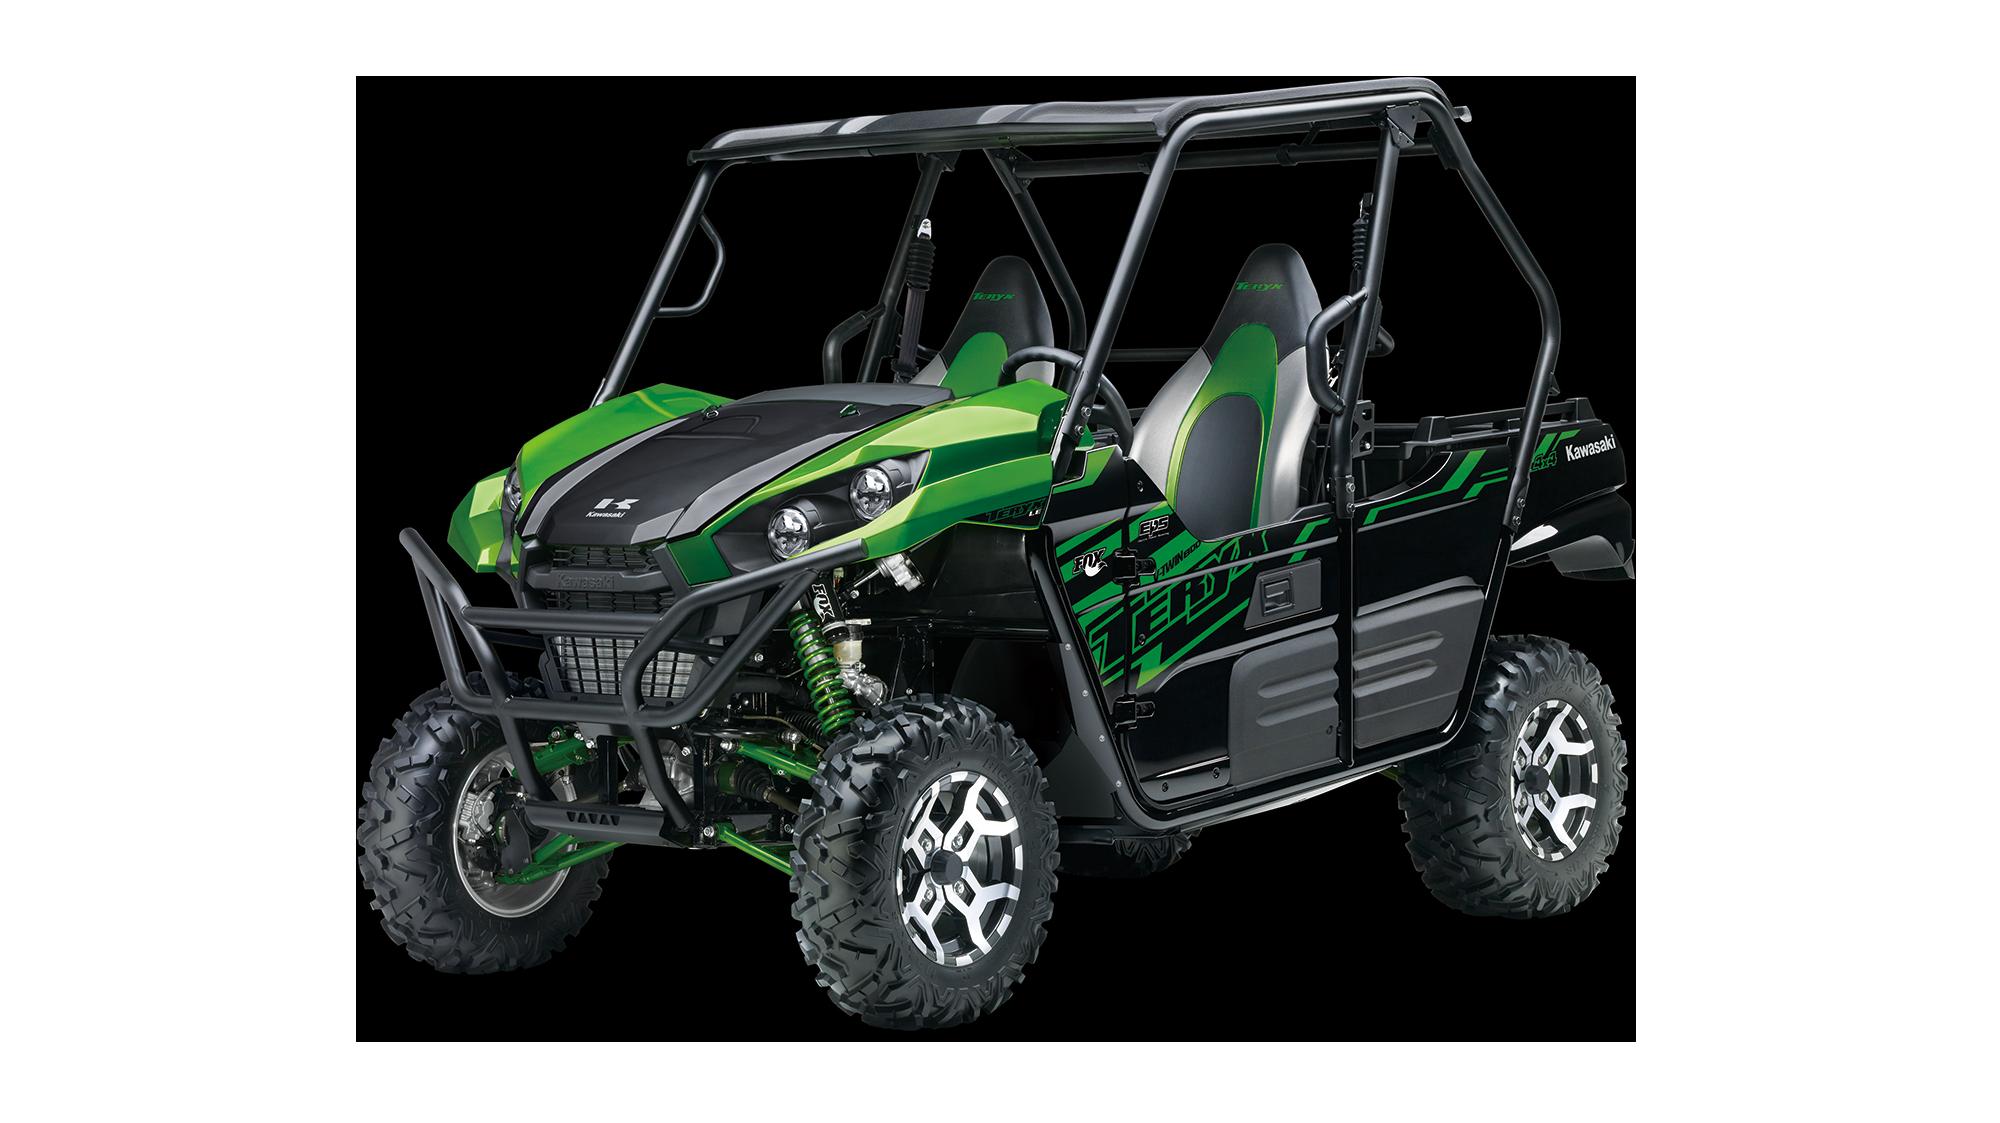 2020 Kawasaki Teryx LE